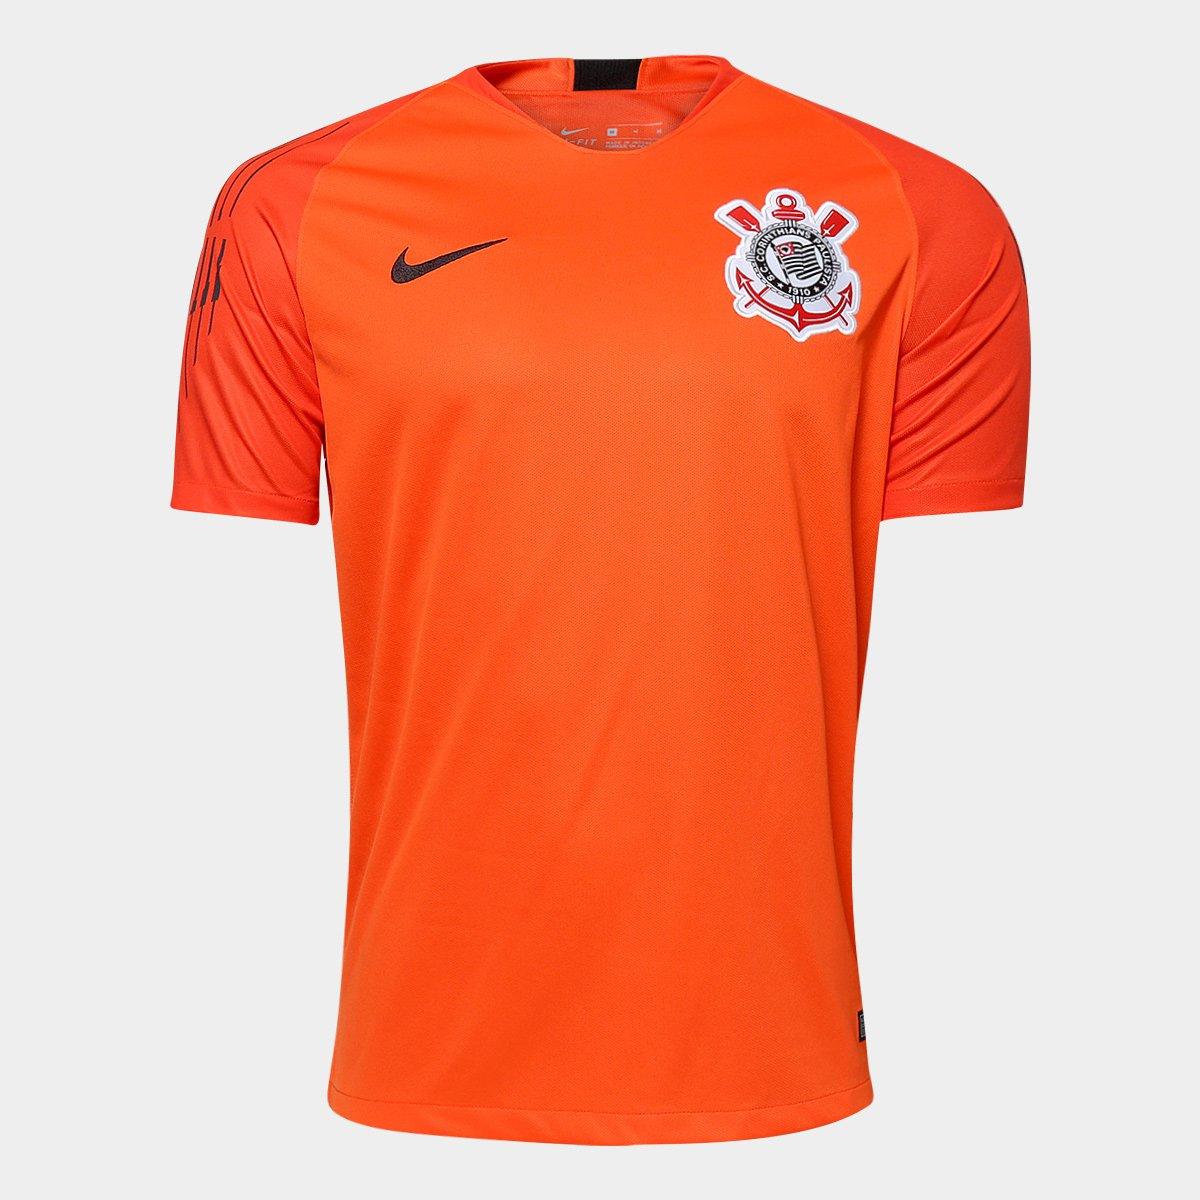 Camisa de Goleiro Corinthians 2018 s n° - Torcedor Nike Masculina ... 2a870ba307edf